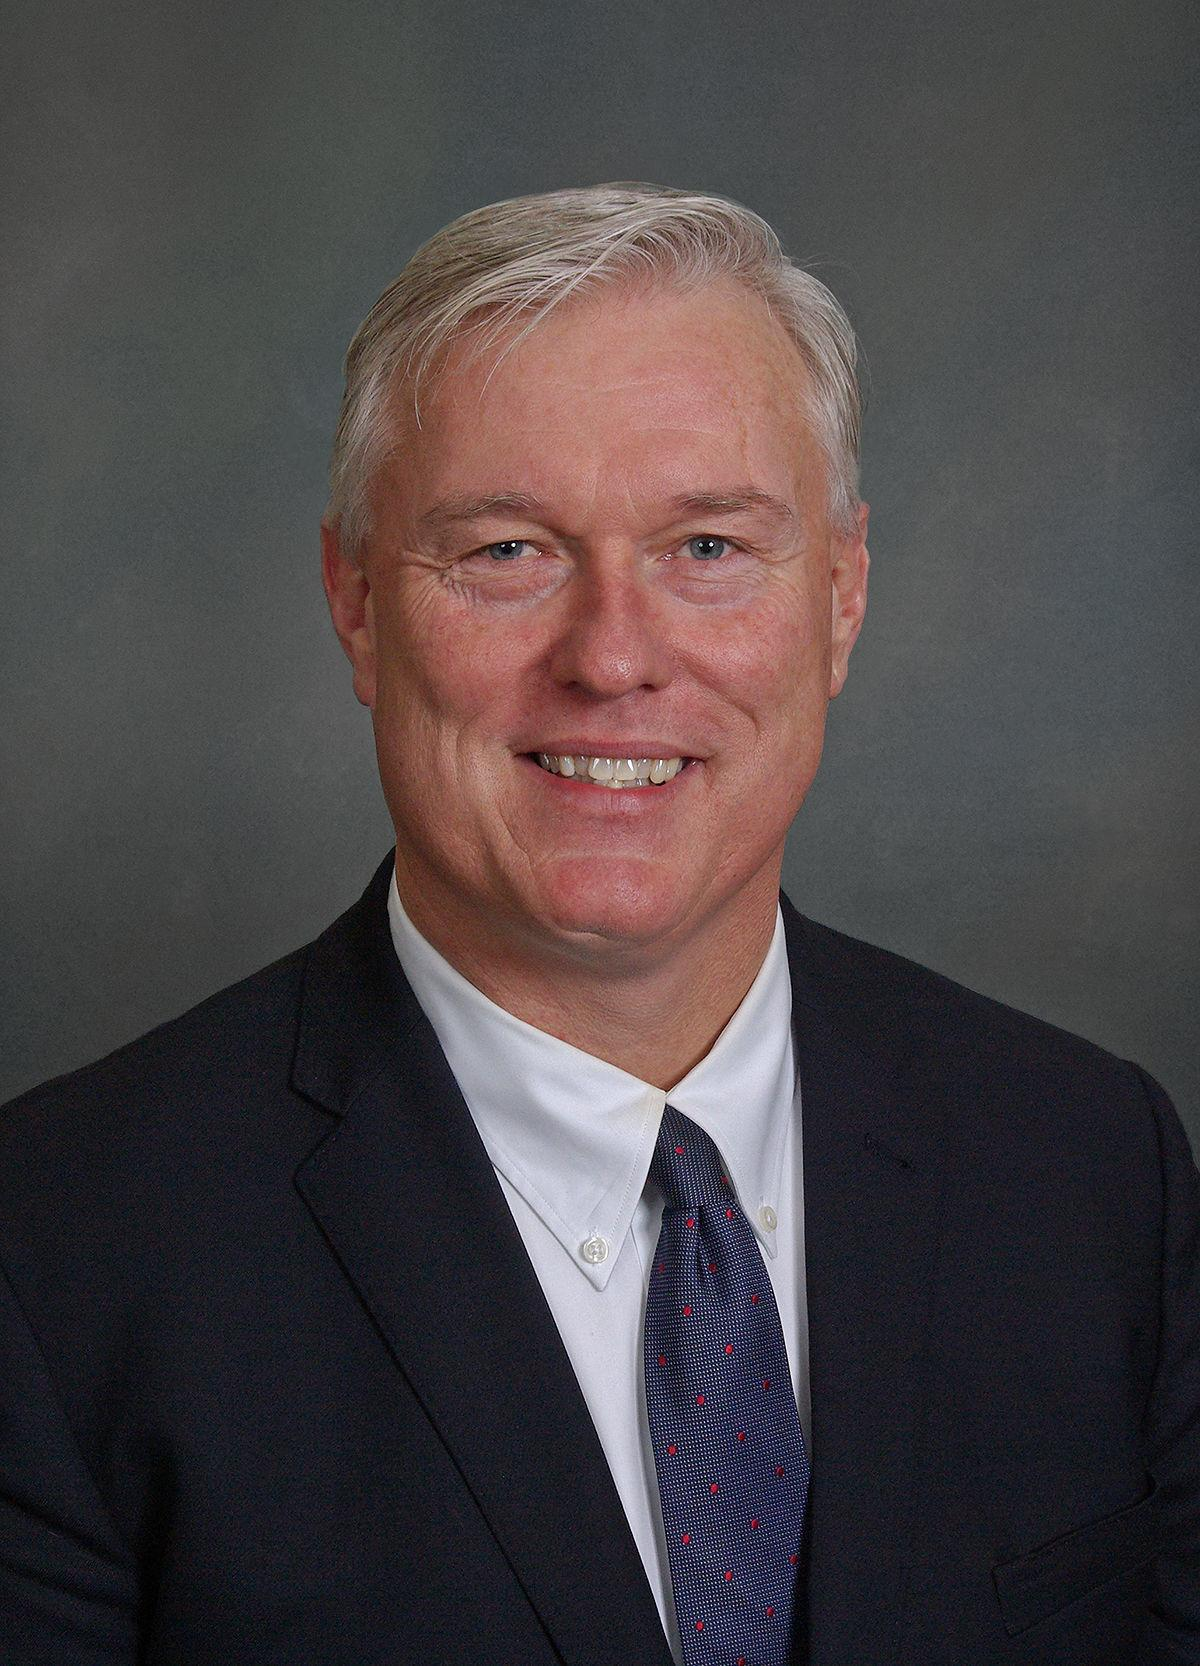 Dr. Mark Church